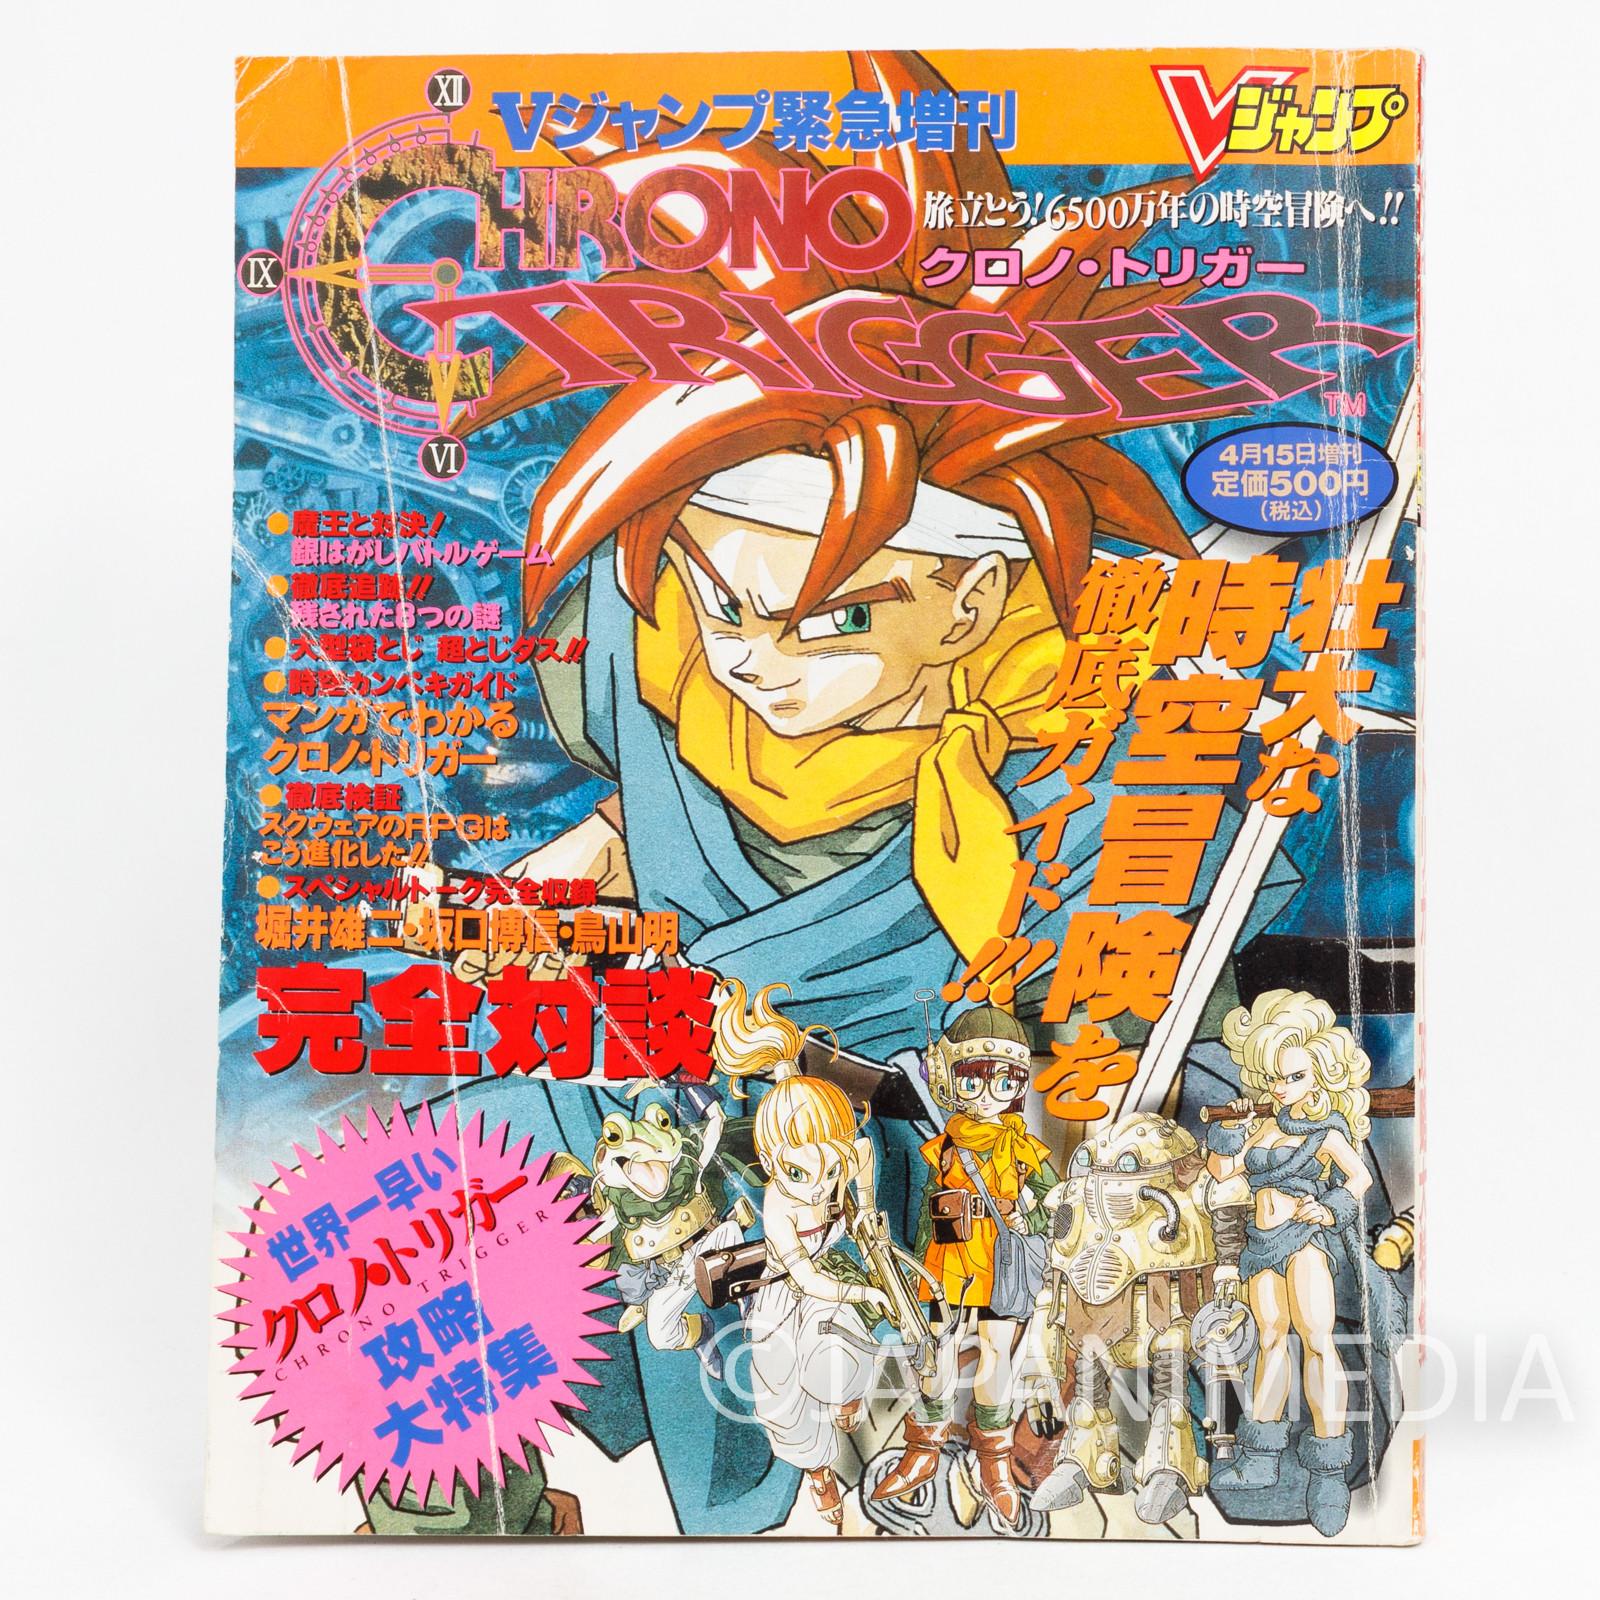 RARE! Chrono Trigger Full-Color Game Guide Book V Jump 1995